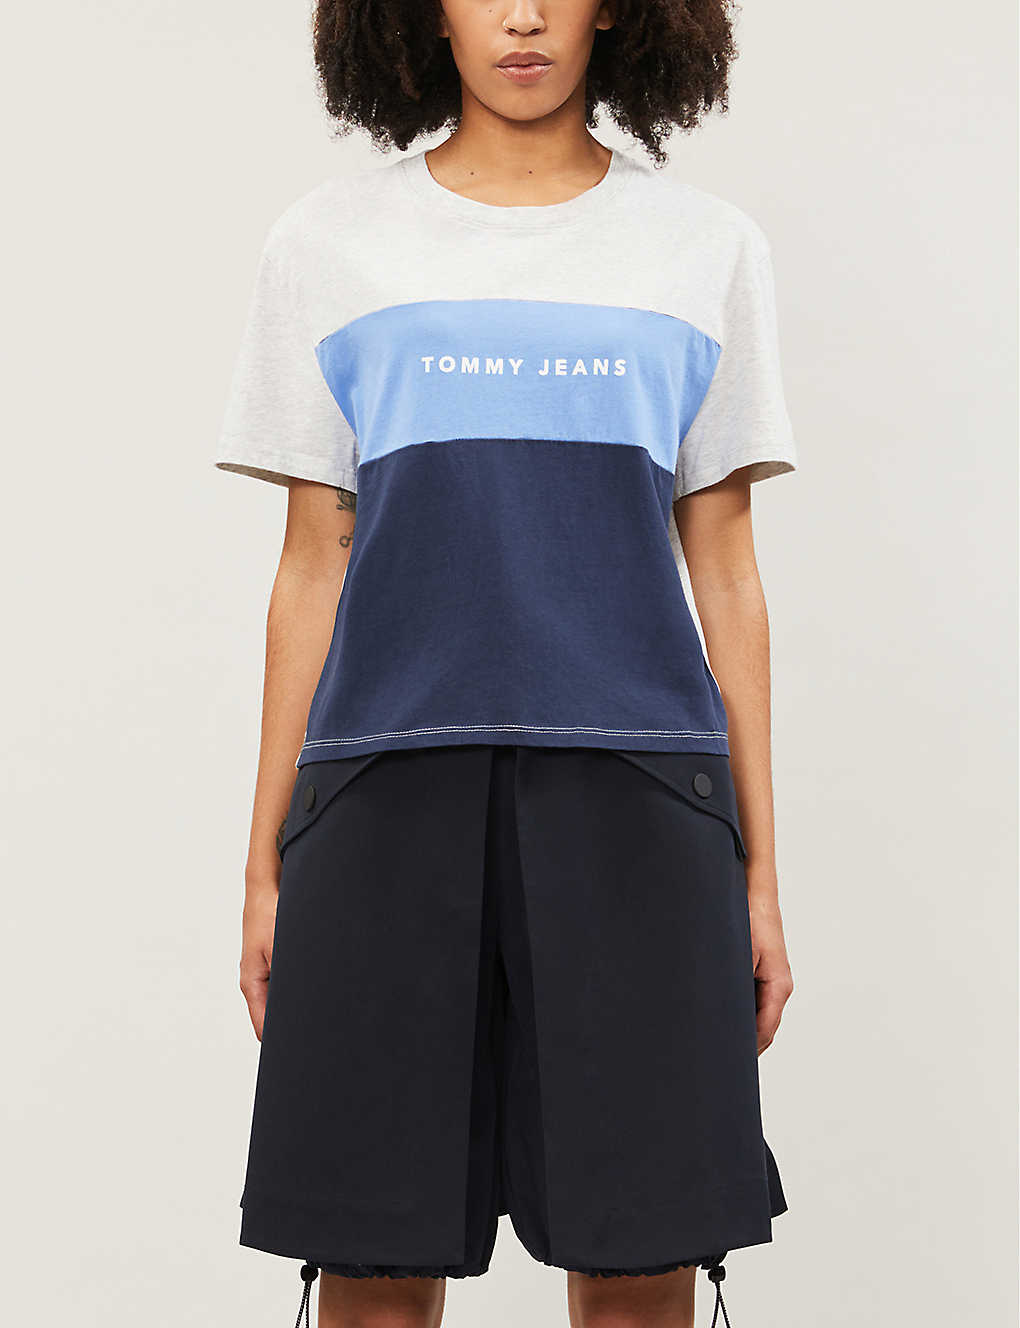 Tommy Jeans Logo Print Striped Cotton Jersey T Shirt Selfridges Com